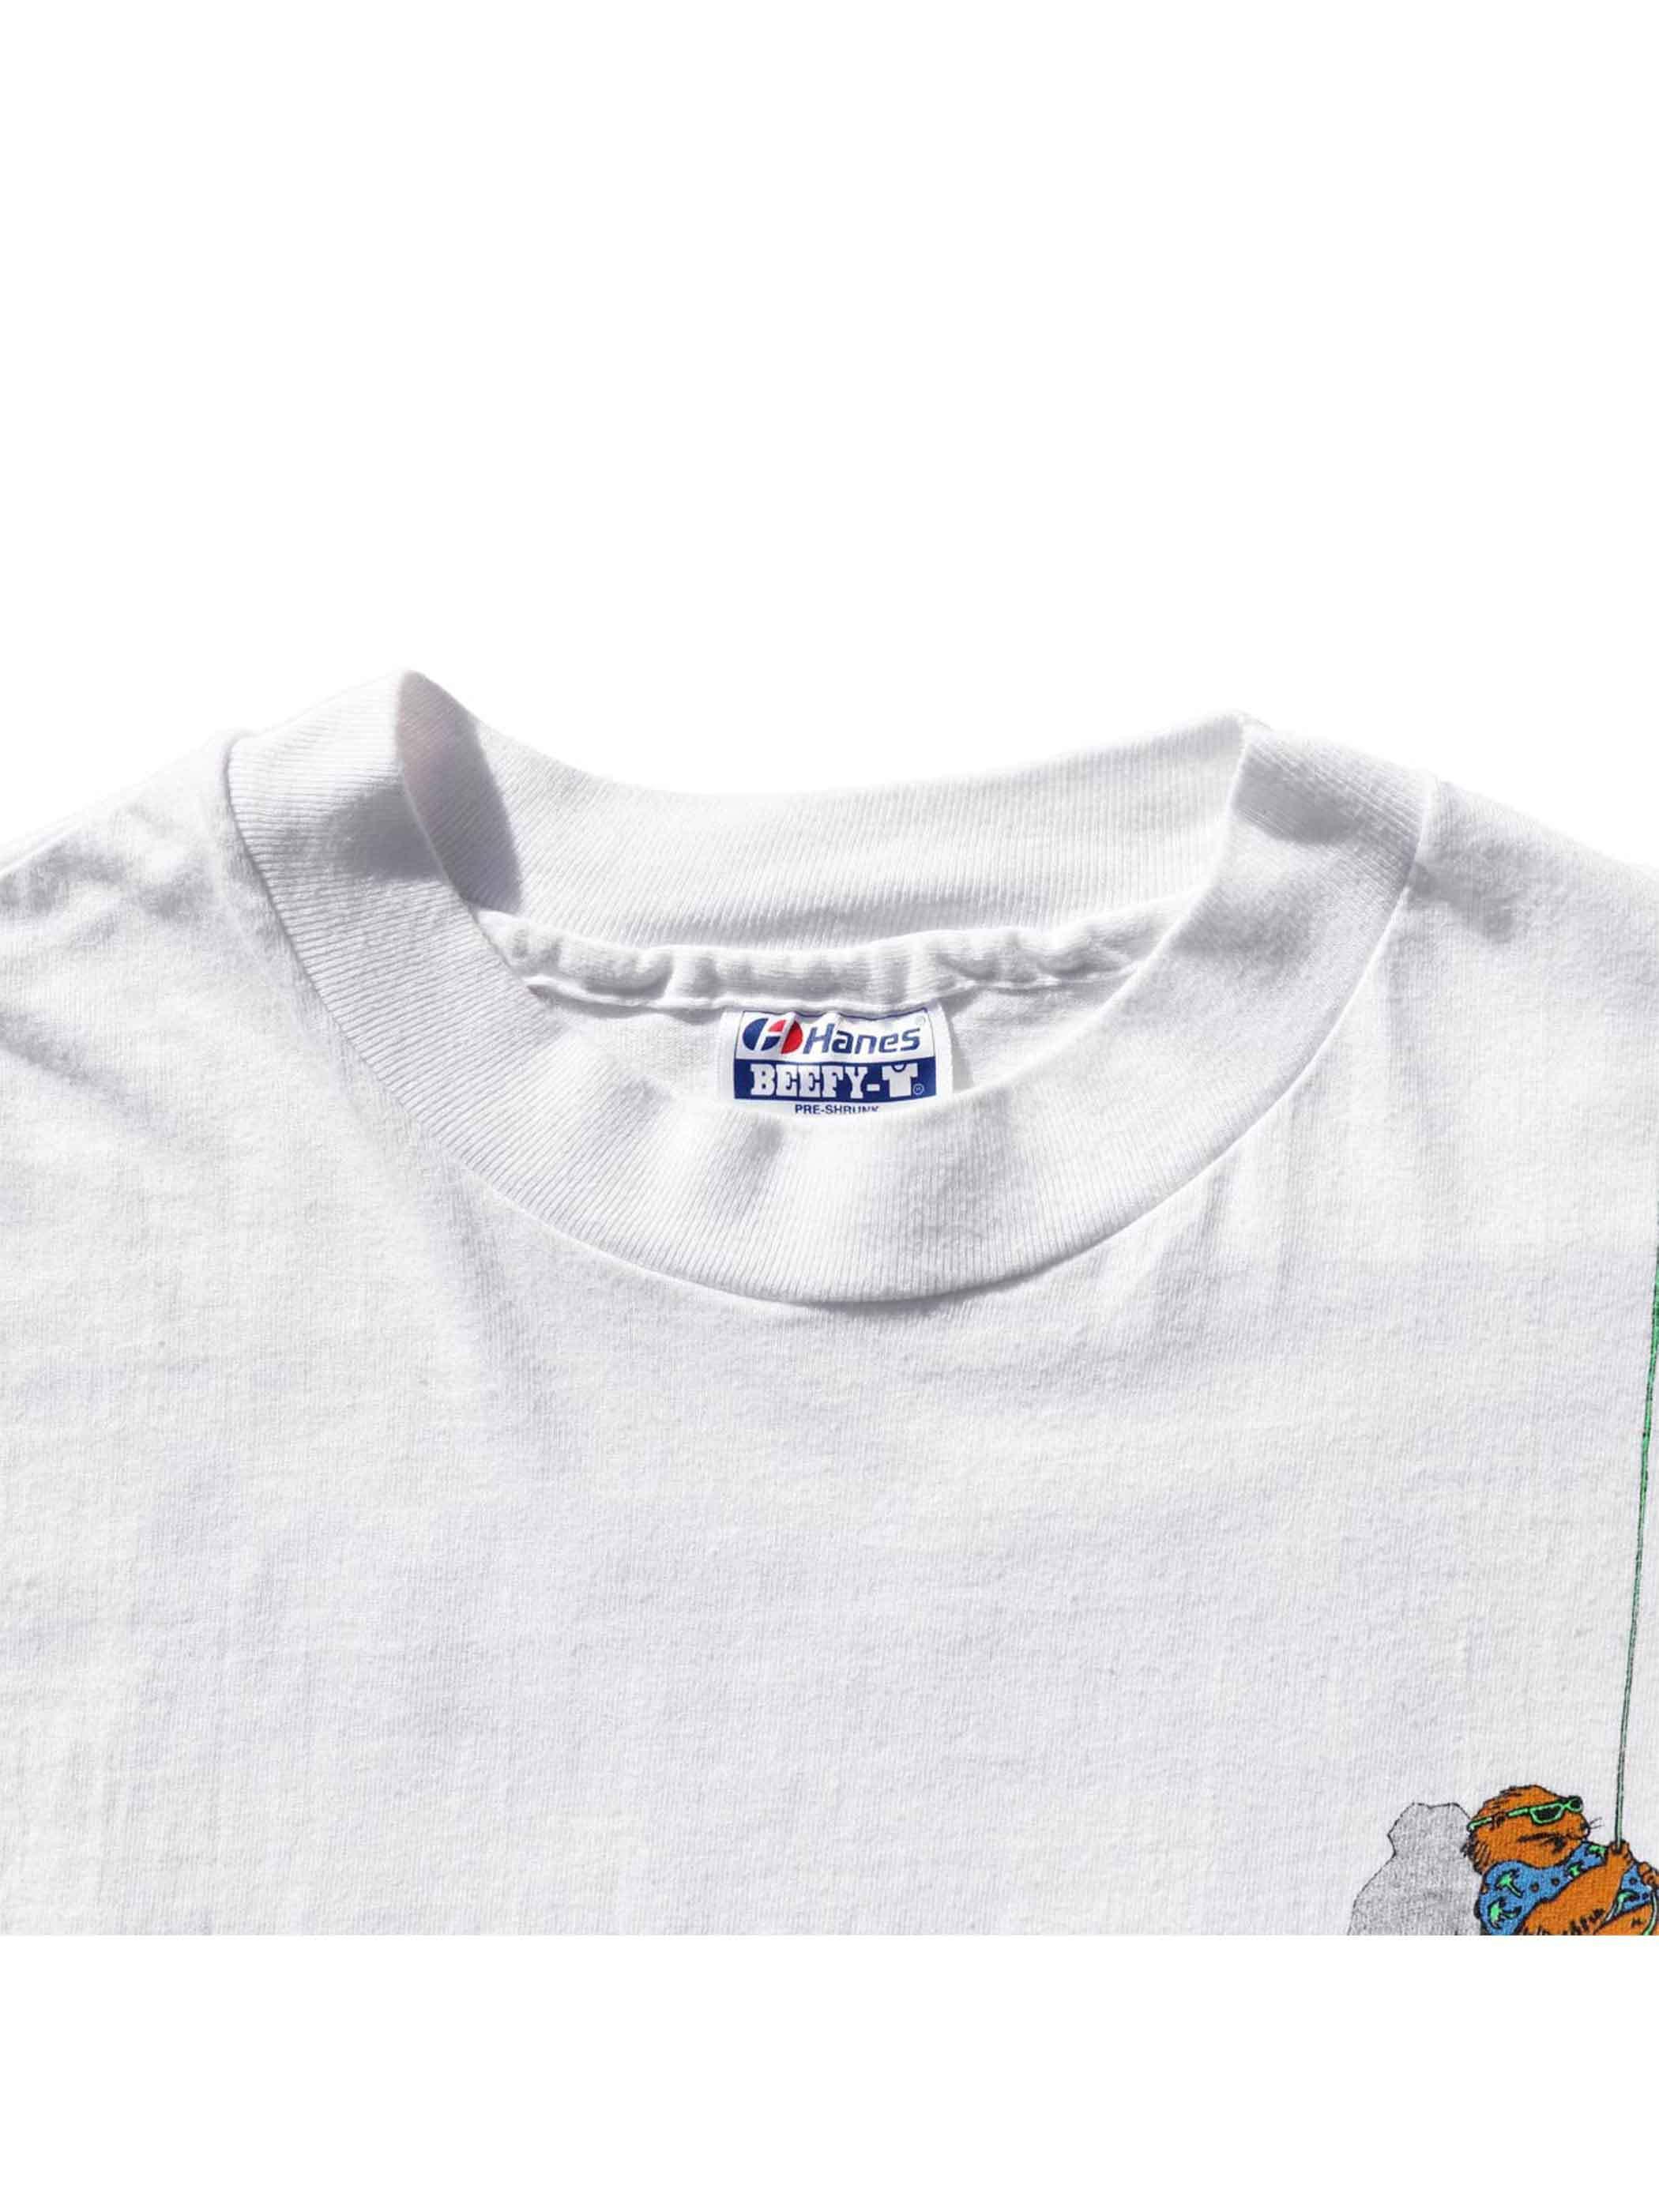 90's MARMOT T-Shirt [XL]